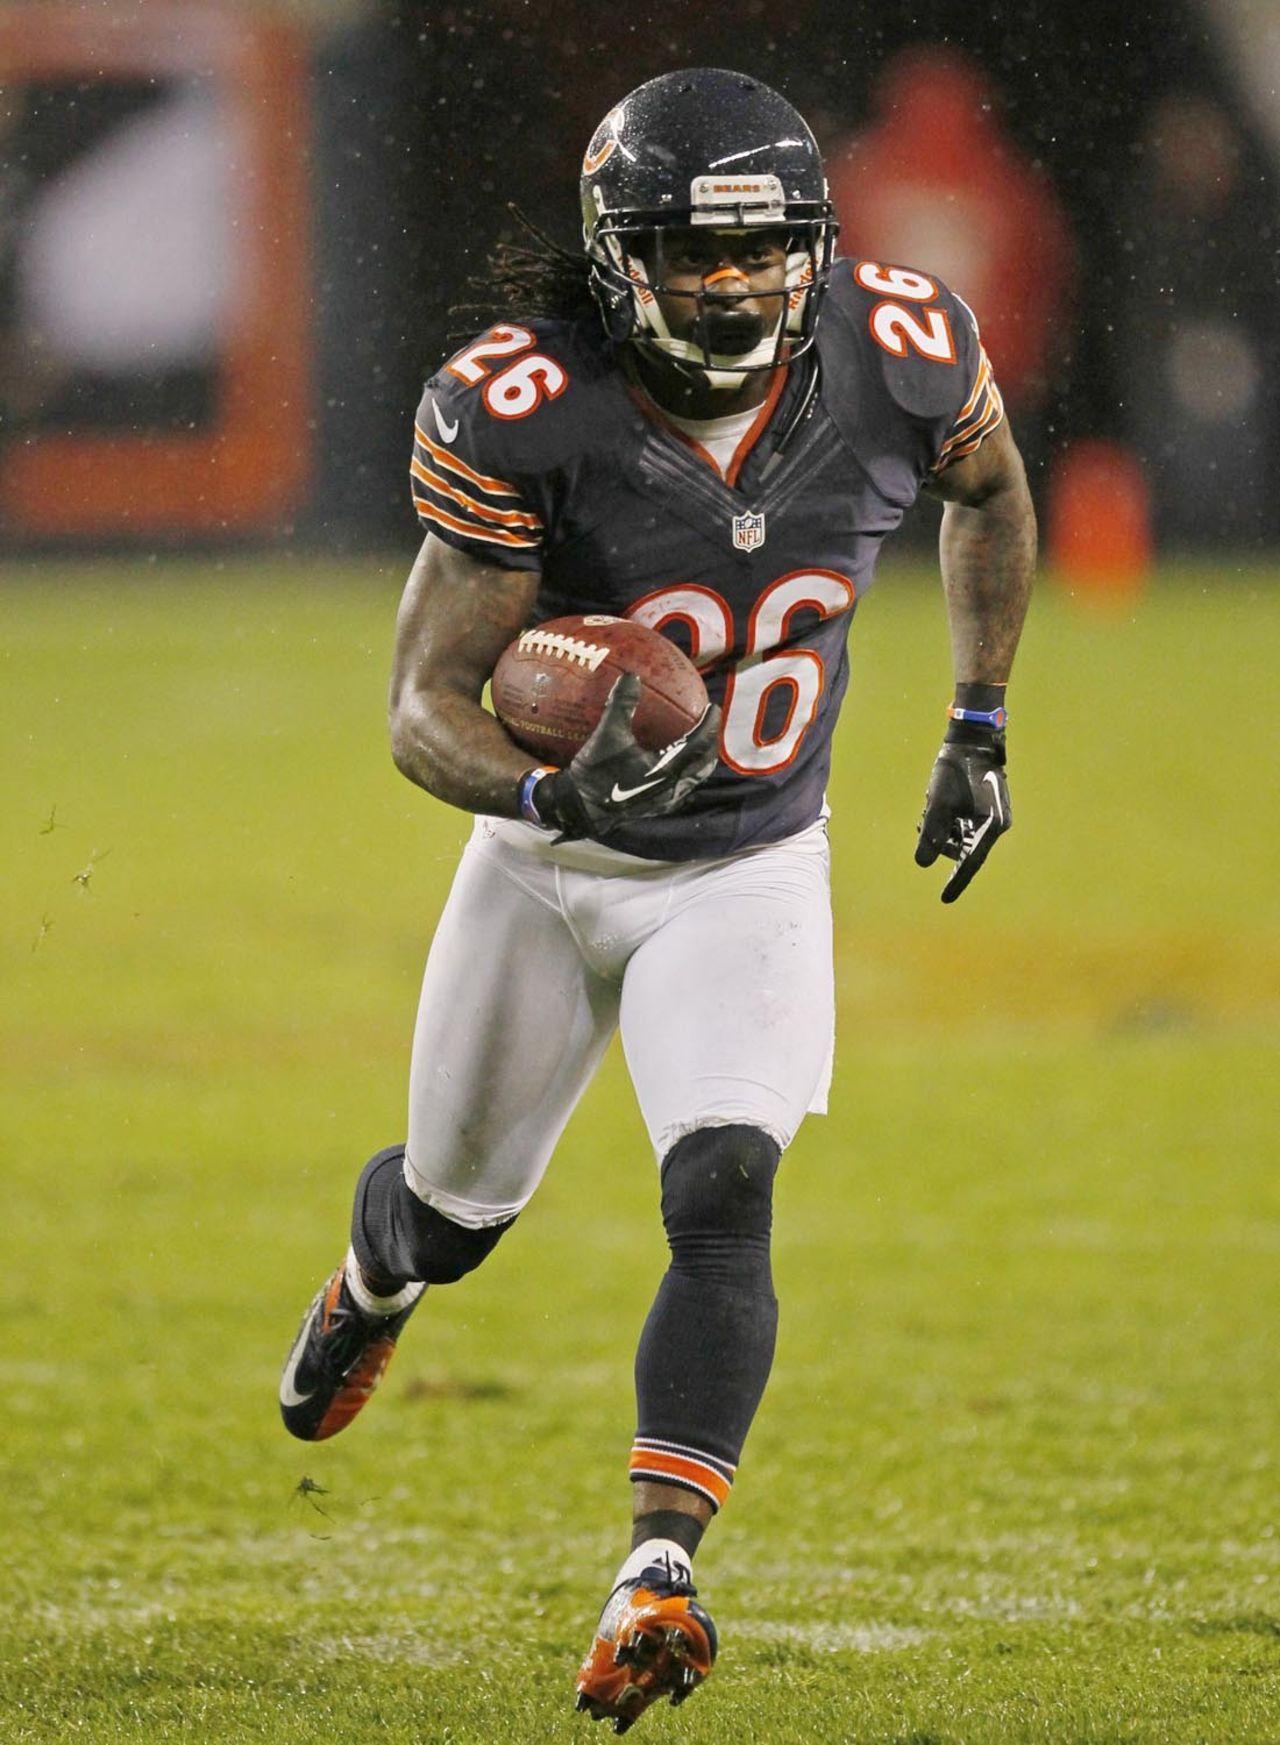 Tim Jennings Chicago sports, Uga football, Chicago bears